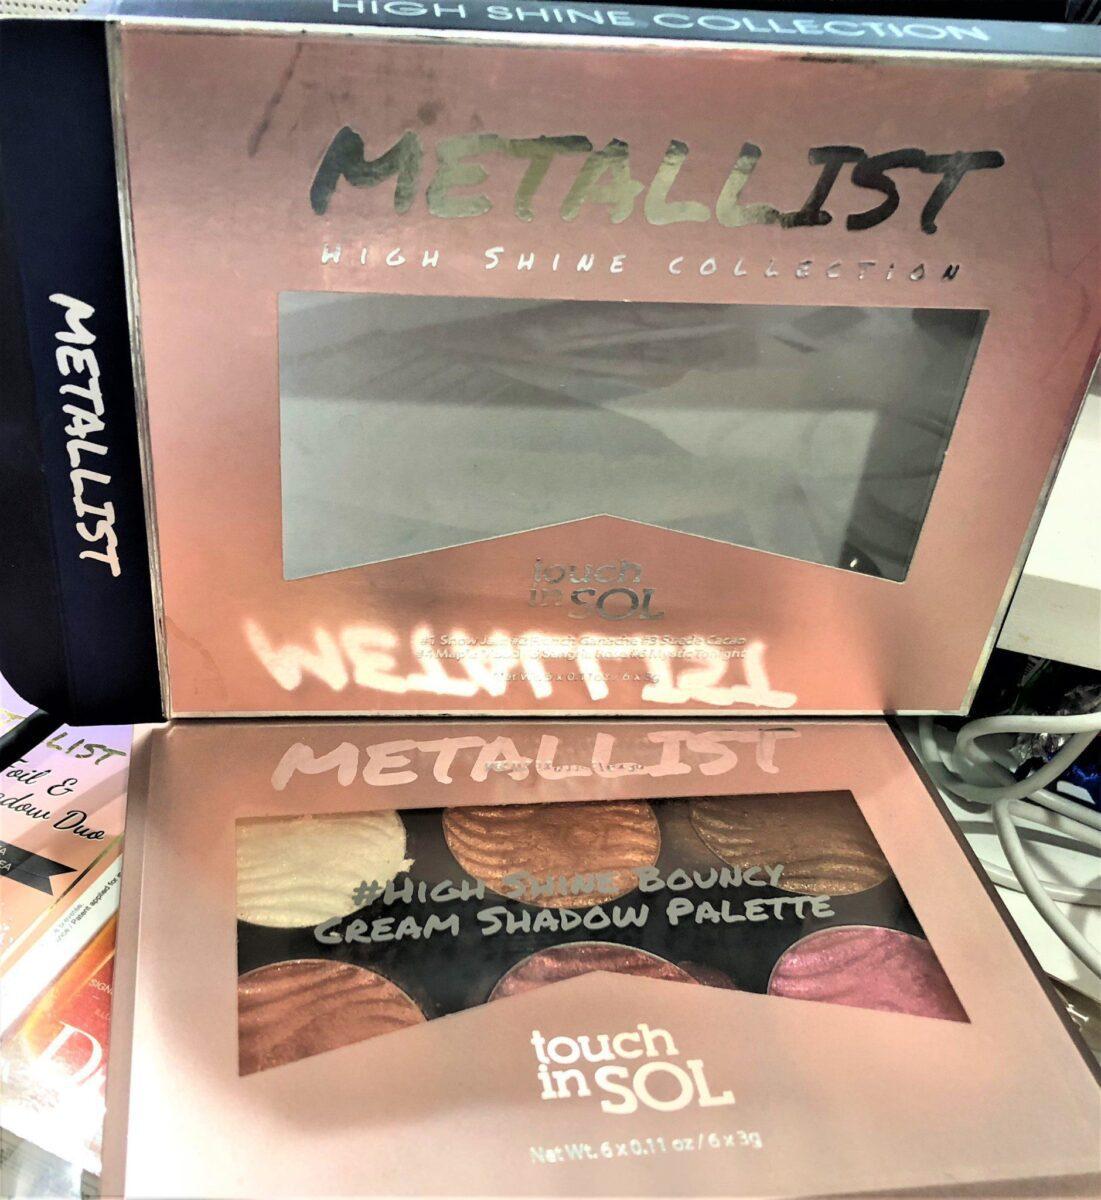 Metallist Bouncy Cream Shado